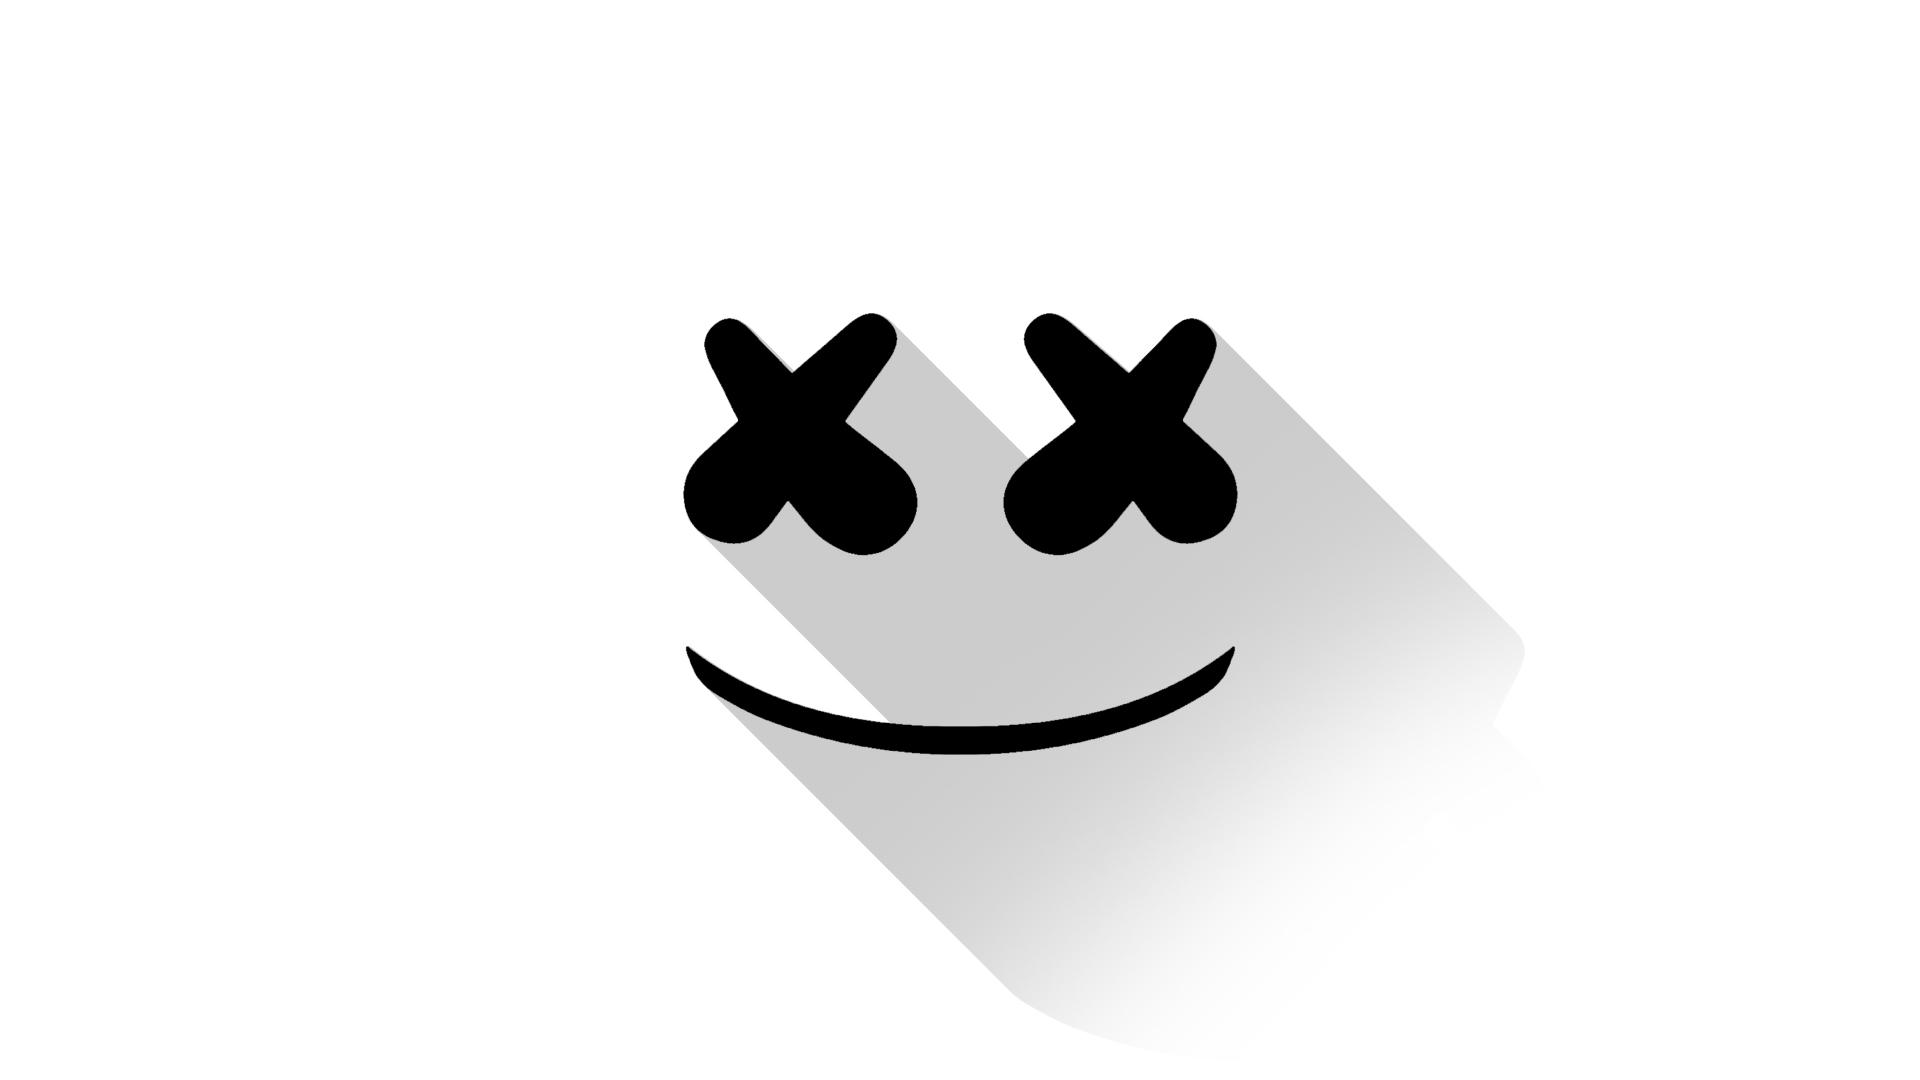 Marshmello Dj Material Design Logo, Hd Music, 4k